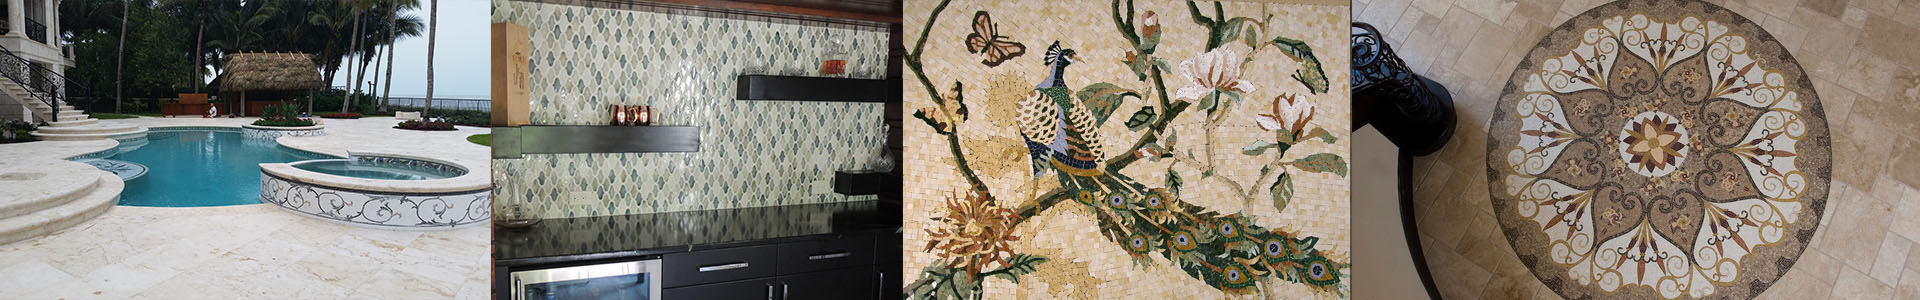 Mosaic-Tile-Raleigh-Boutique-Kitchen-Bathroom-Counter-Floor